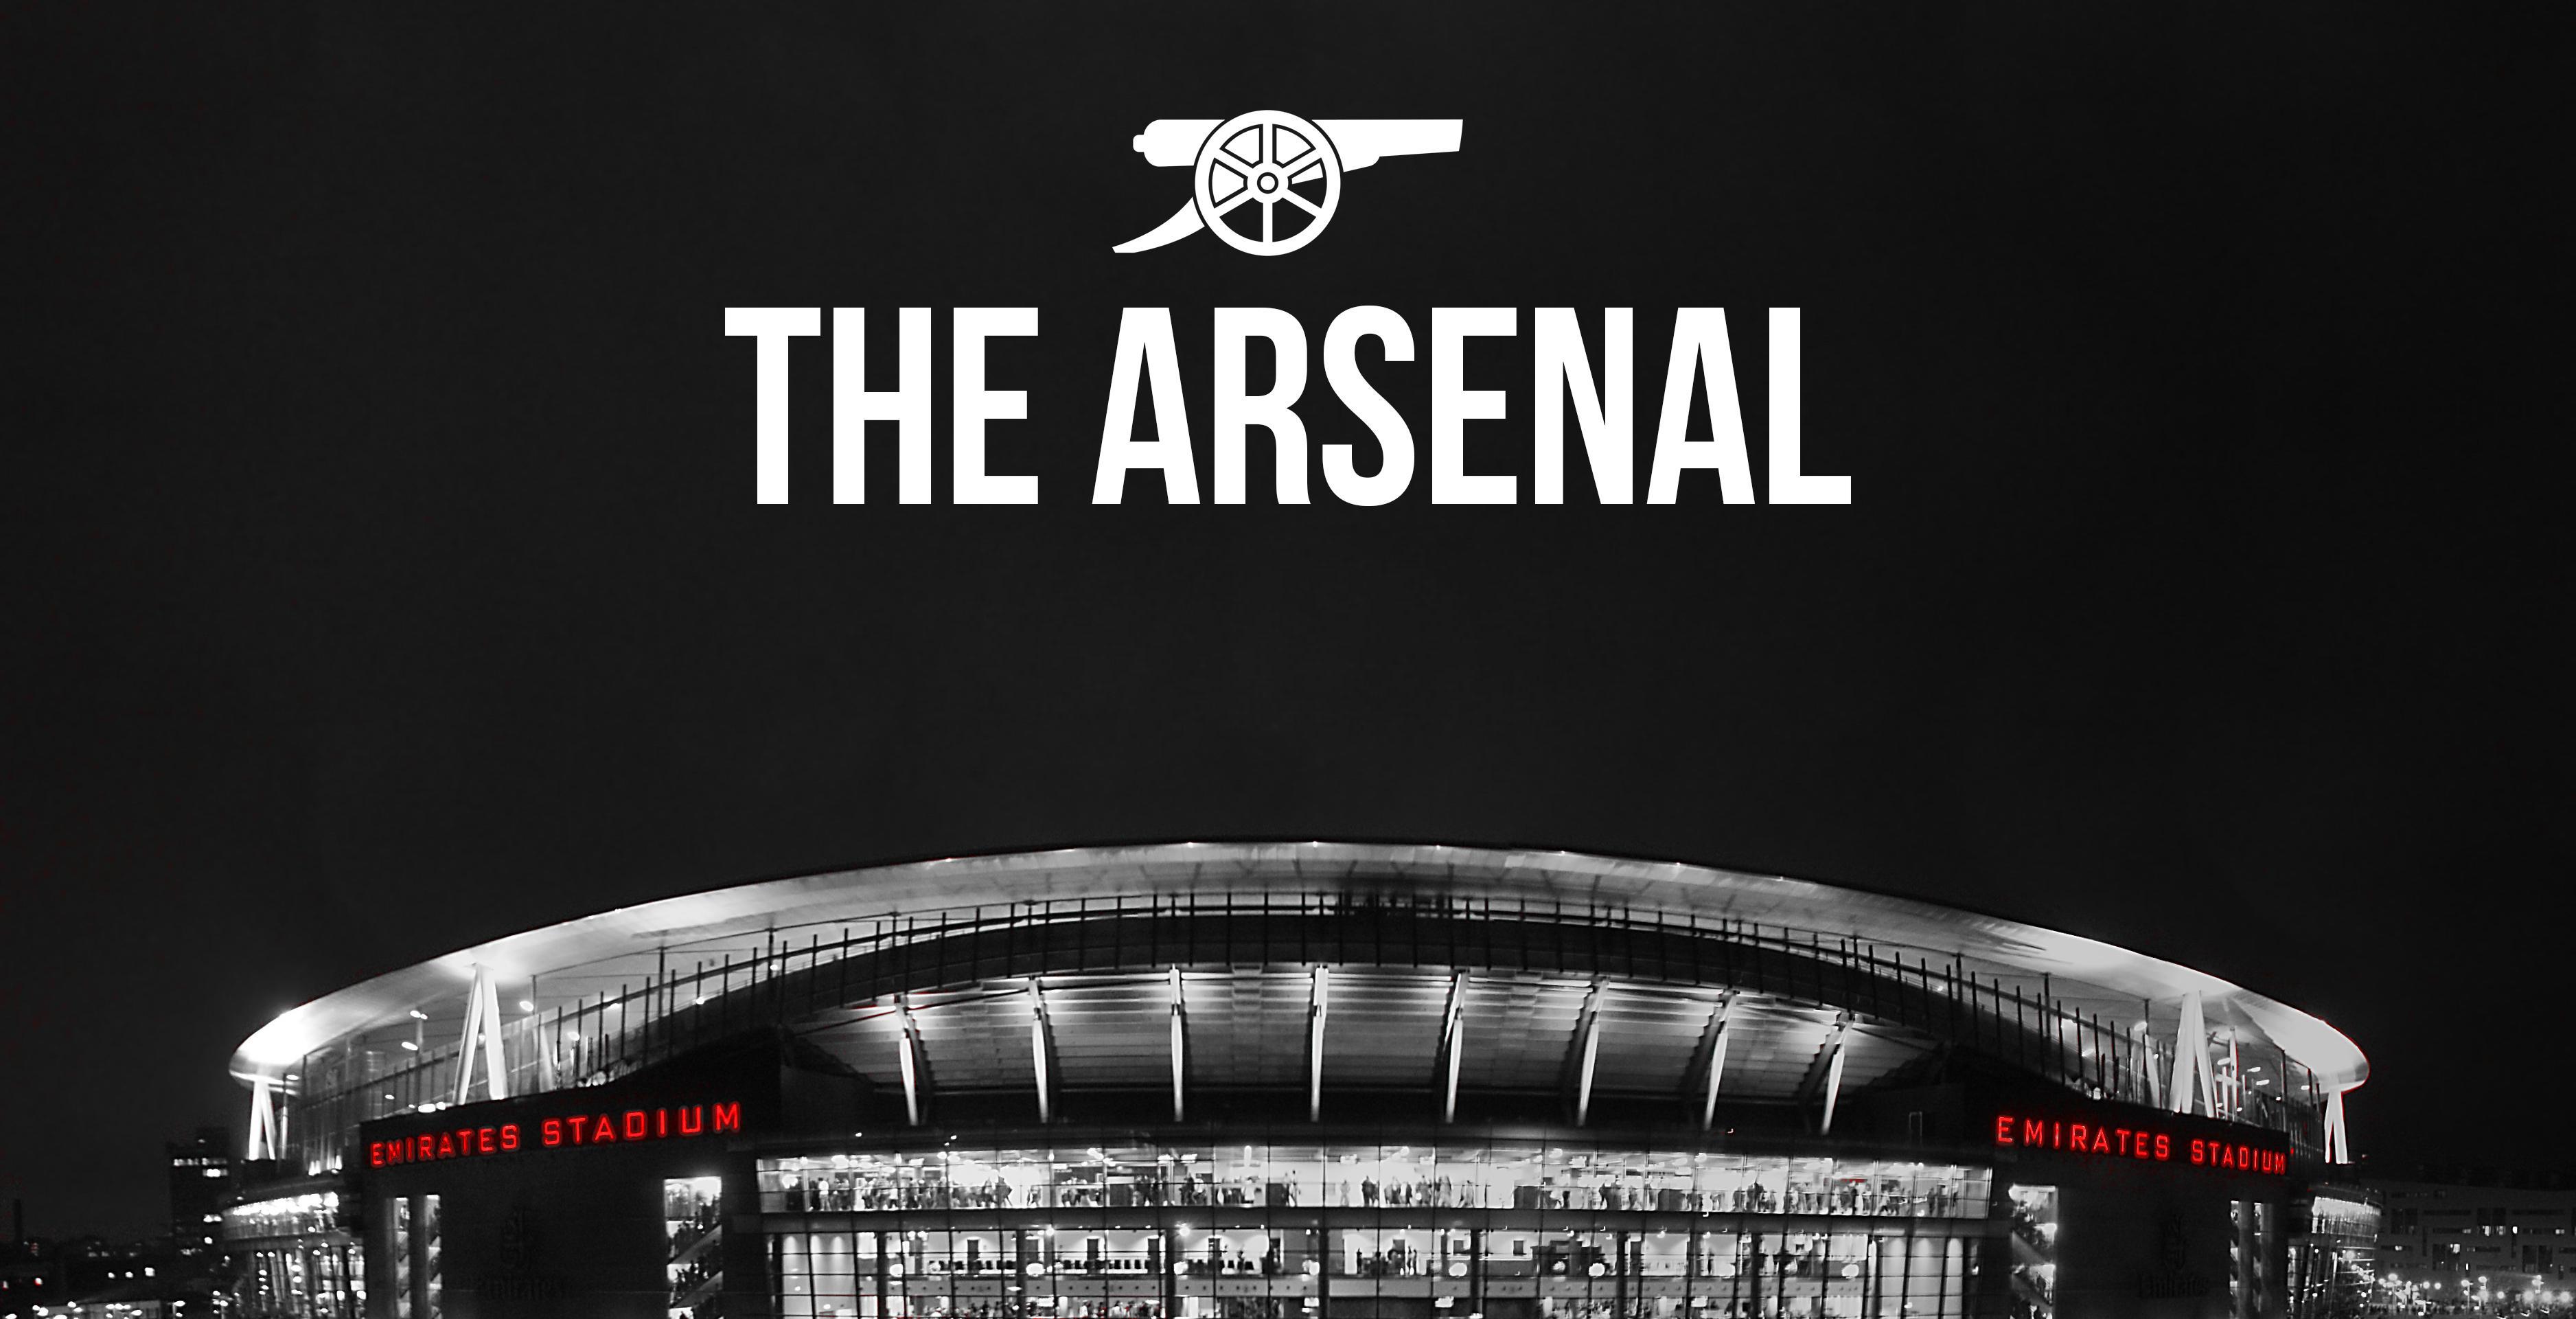 75 Arsenal Wallpaper Hd On Wallpapersafari